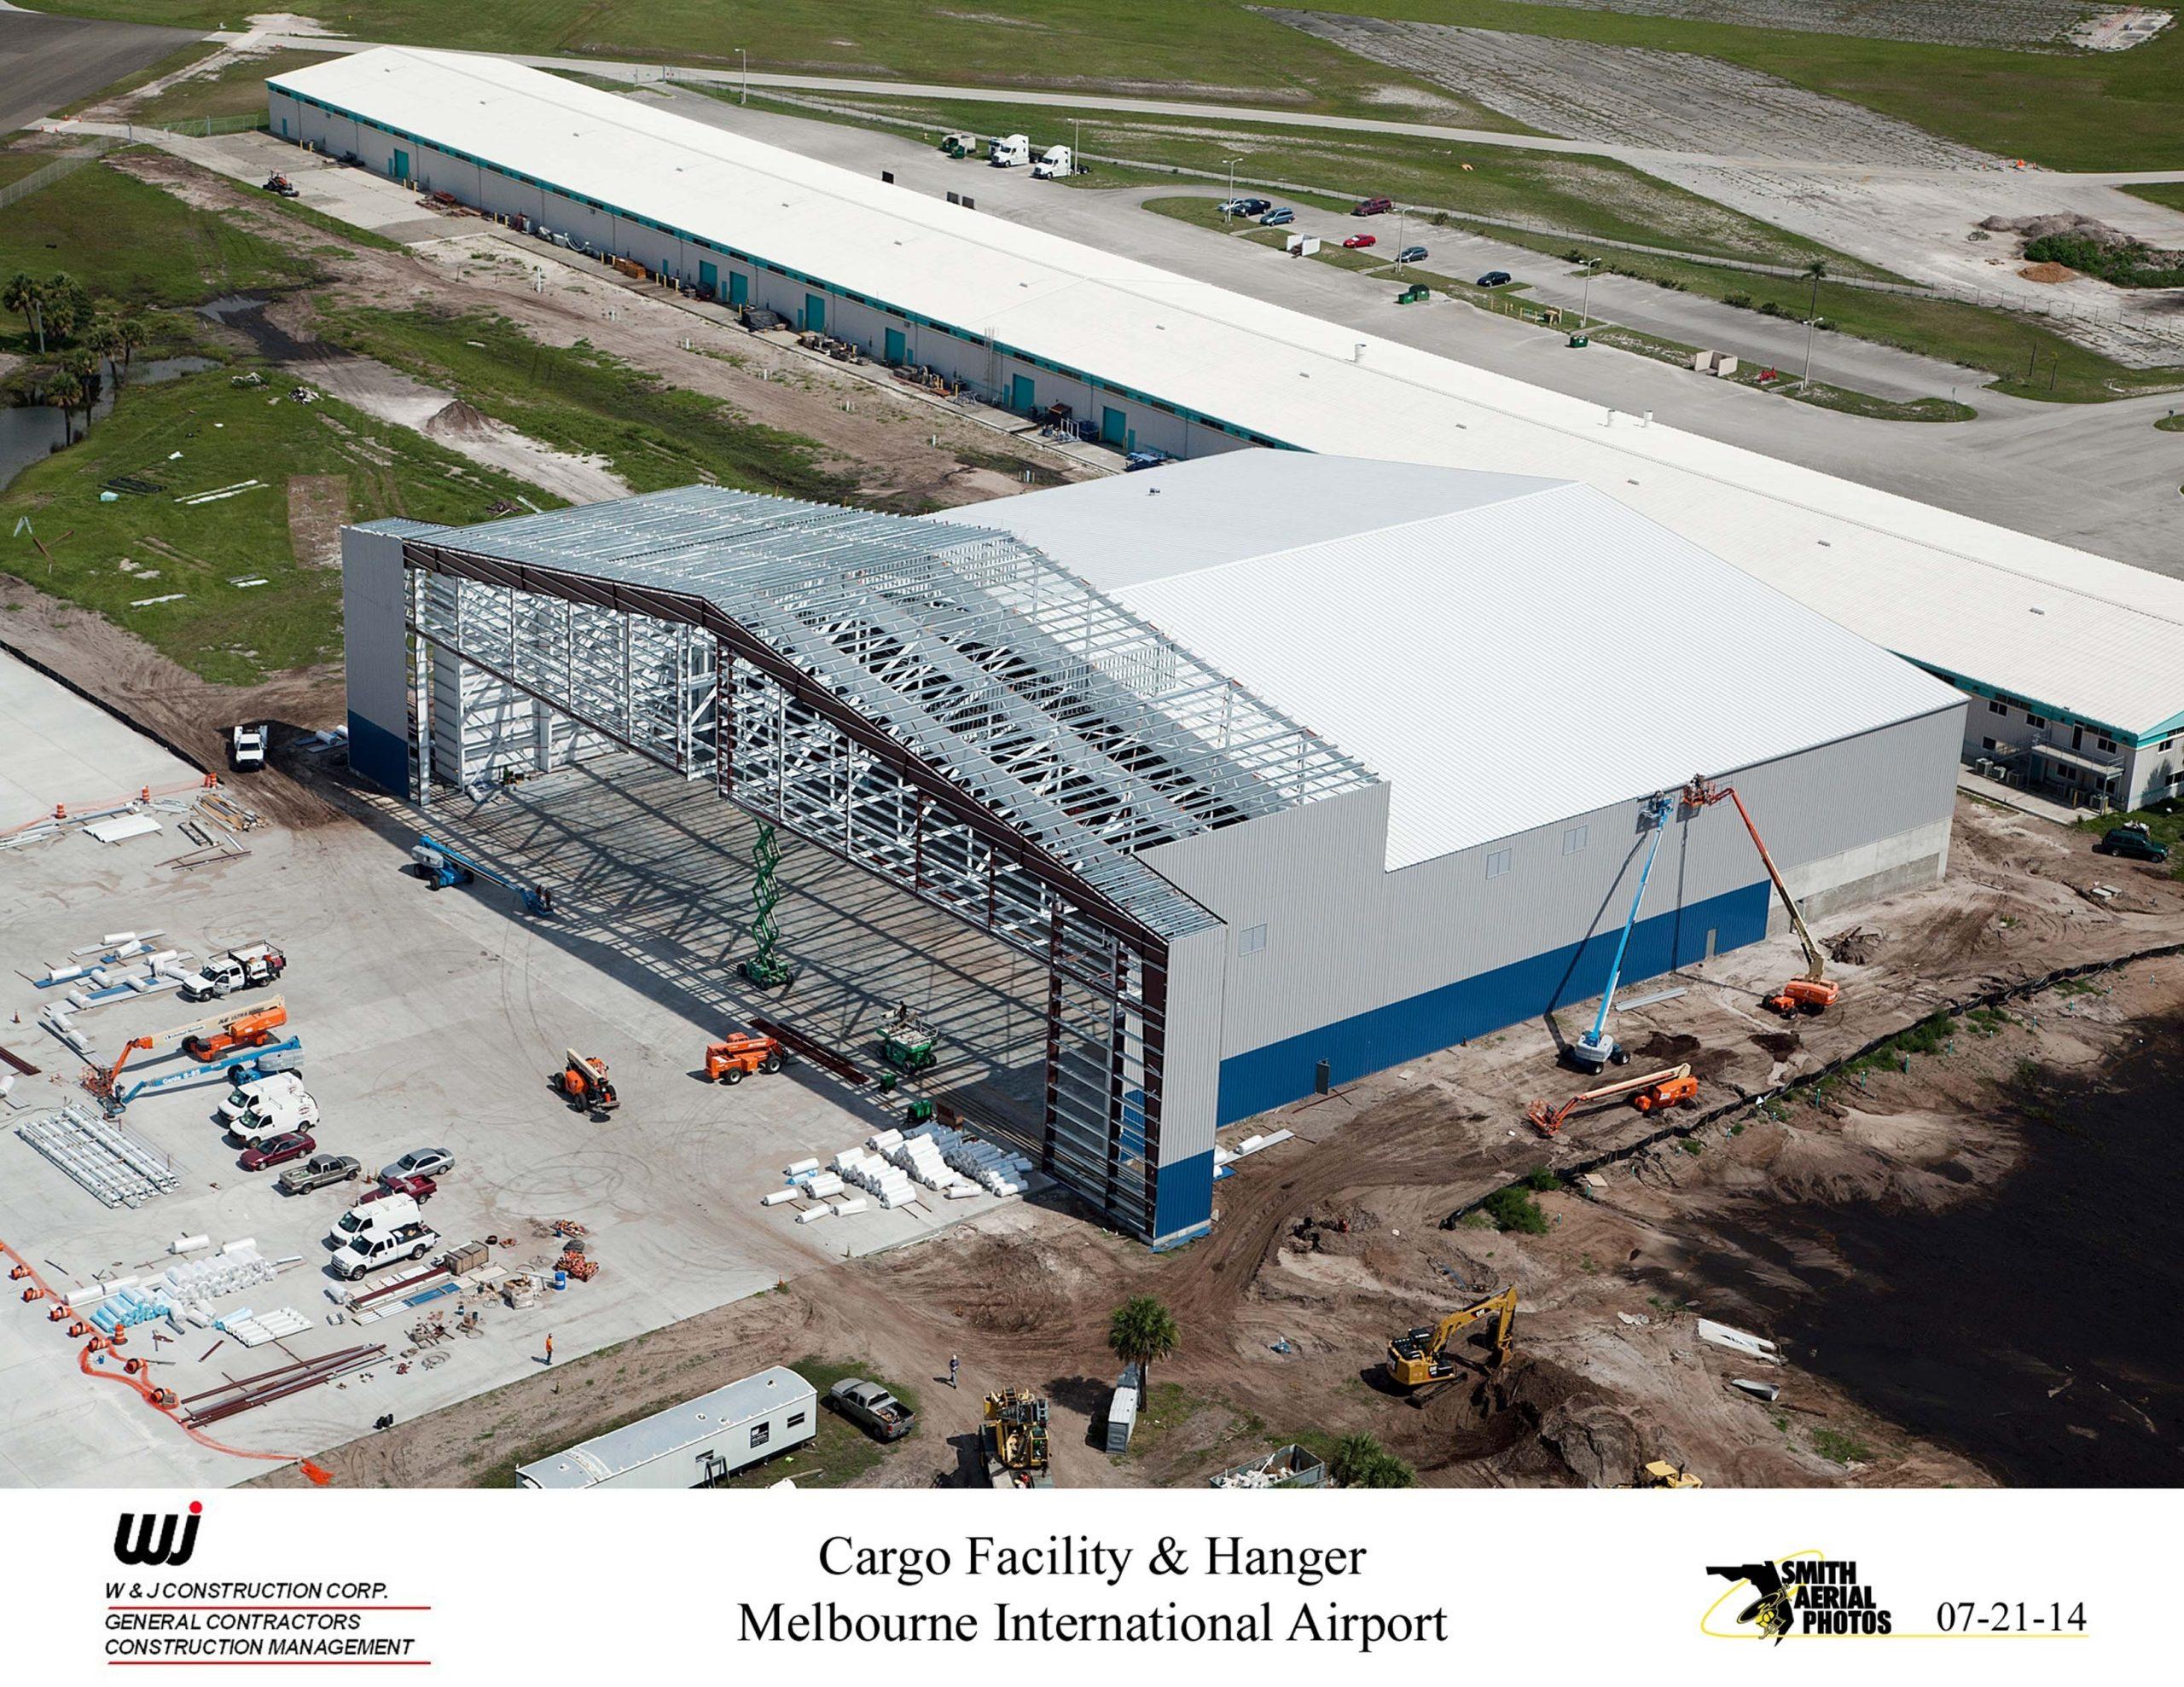 Melbourne Airport Cargo Facility & Hangar - W+J Construction inside Trs Facility Melbourne Airport Map